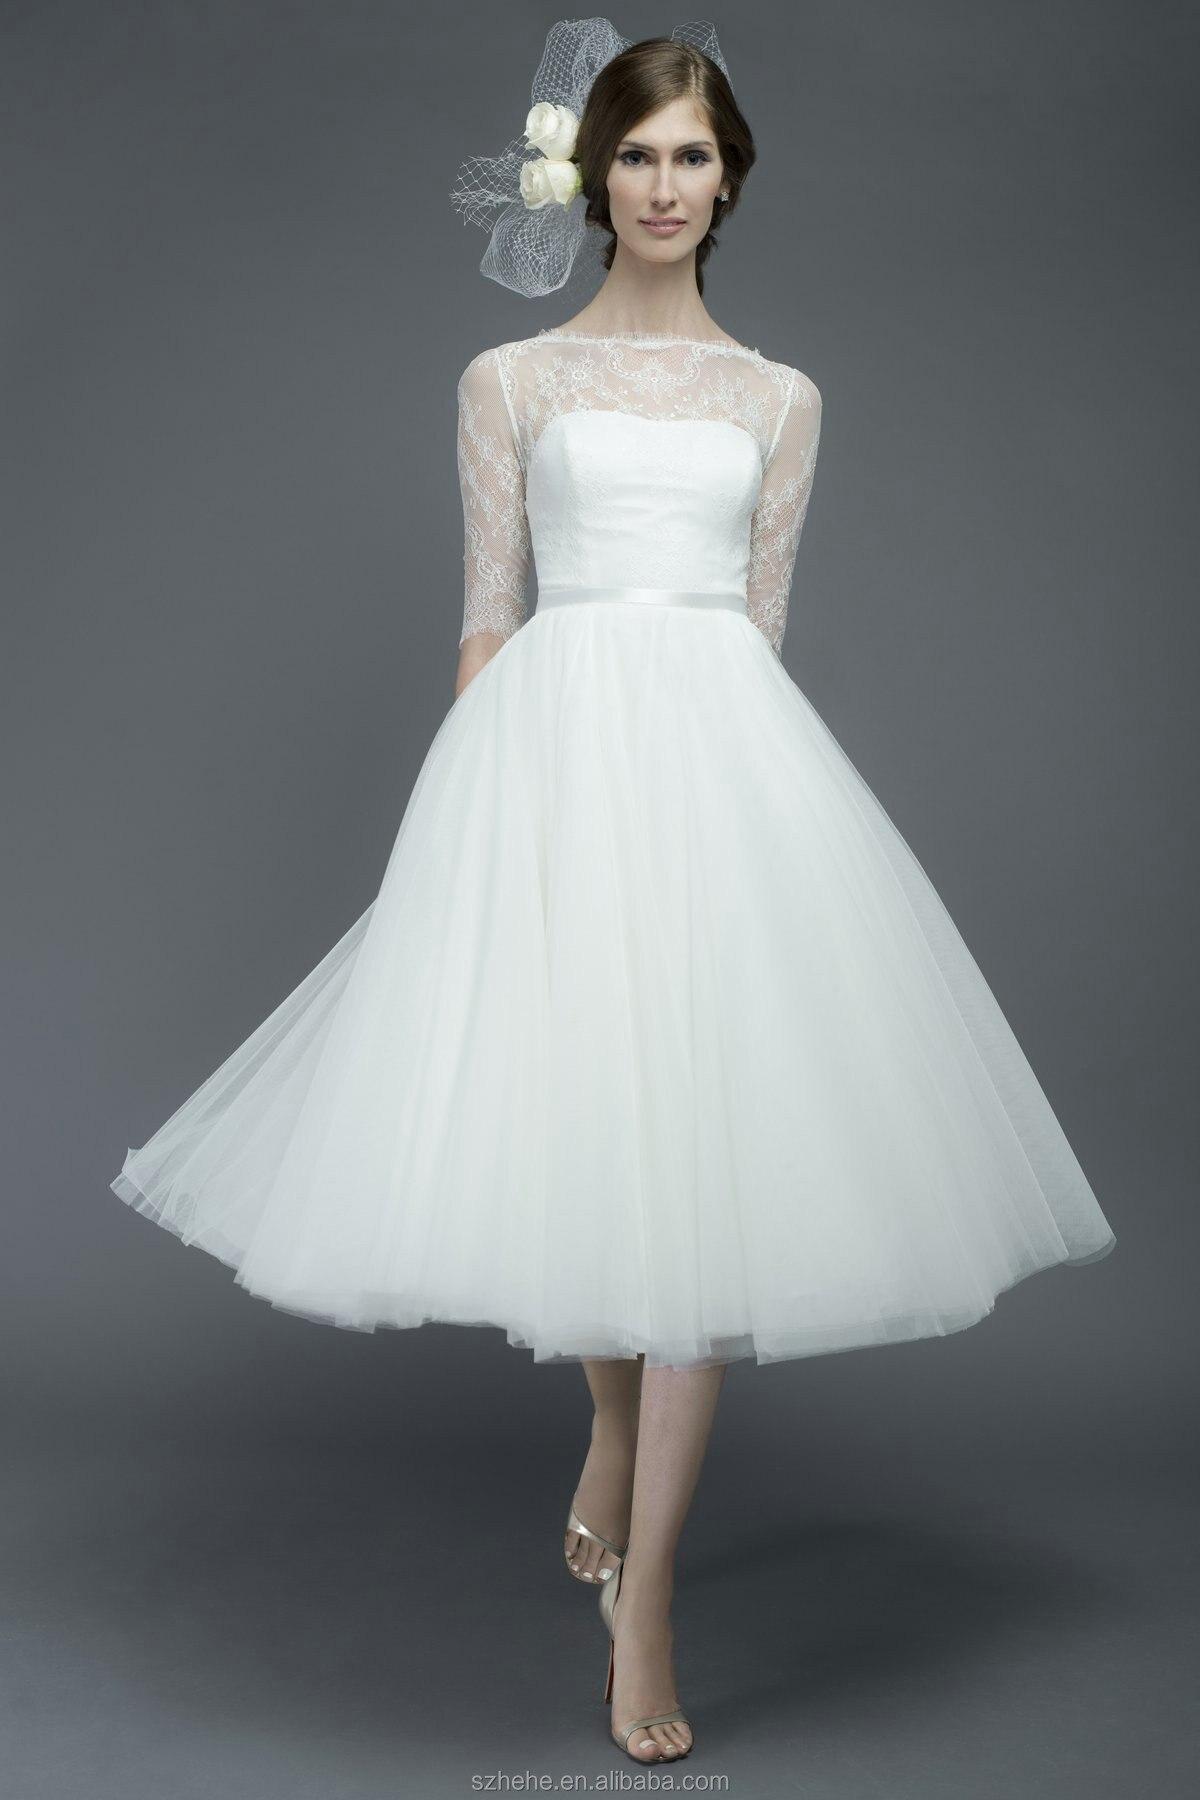 Bridals CW3198 Elegant vintage designer country western tea length wedding  dresses with sleeves-in Wedding Dresses from Weddings   Events on  Aliexpress.com ... 693179160f80